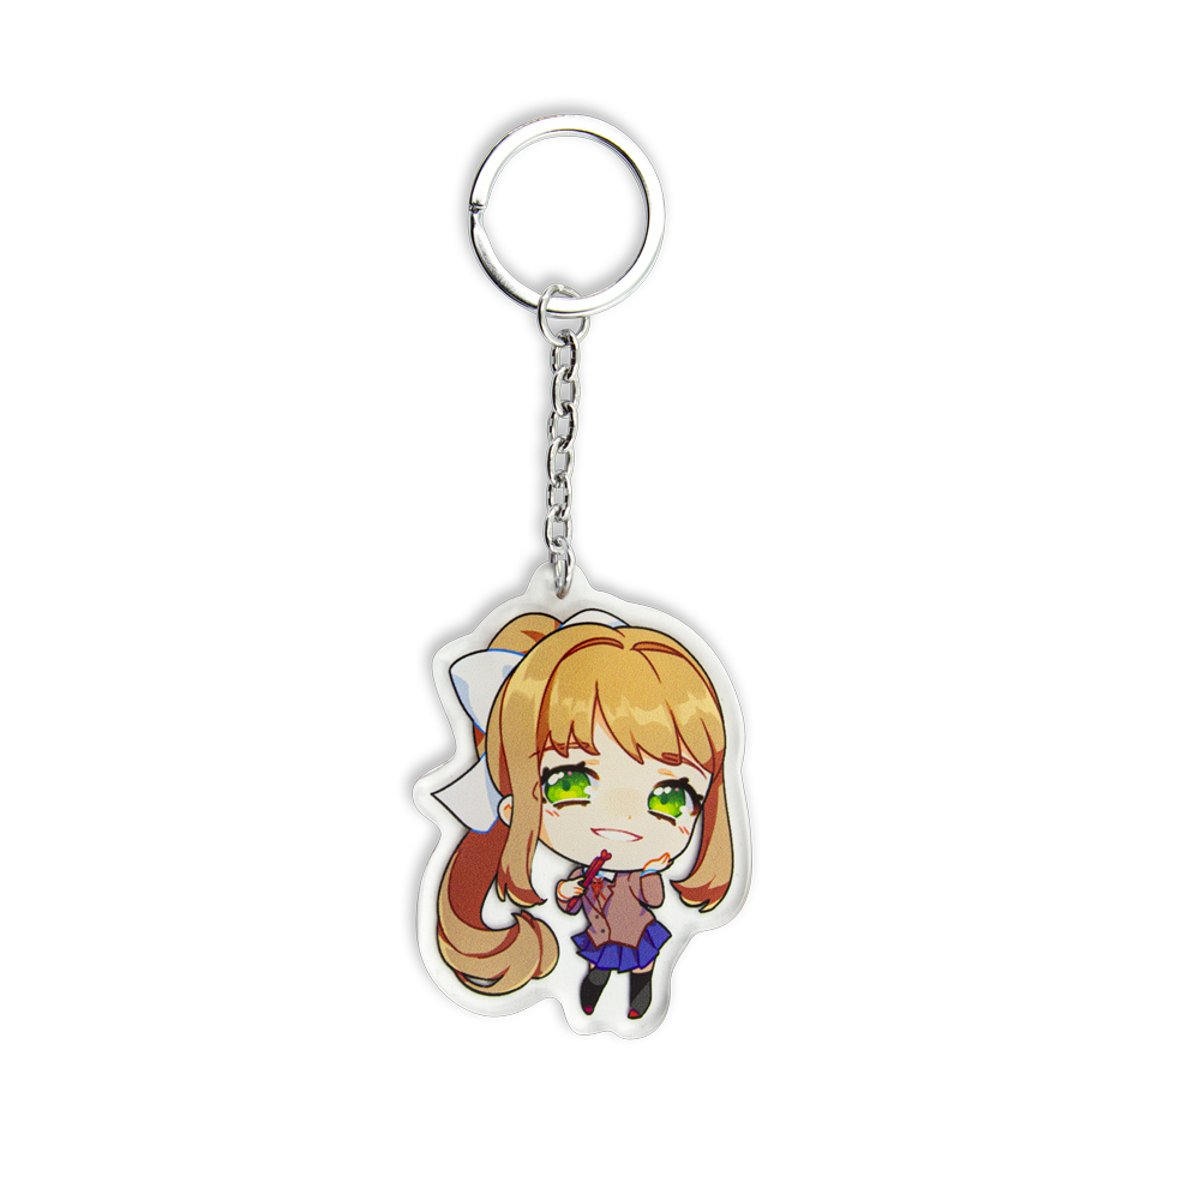 Monika Con Exclusive Keychain